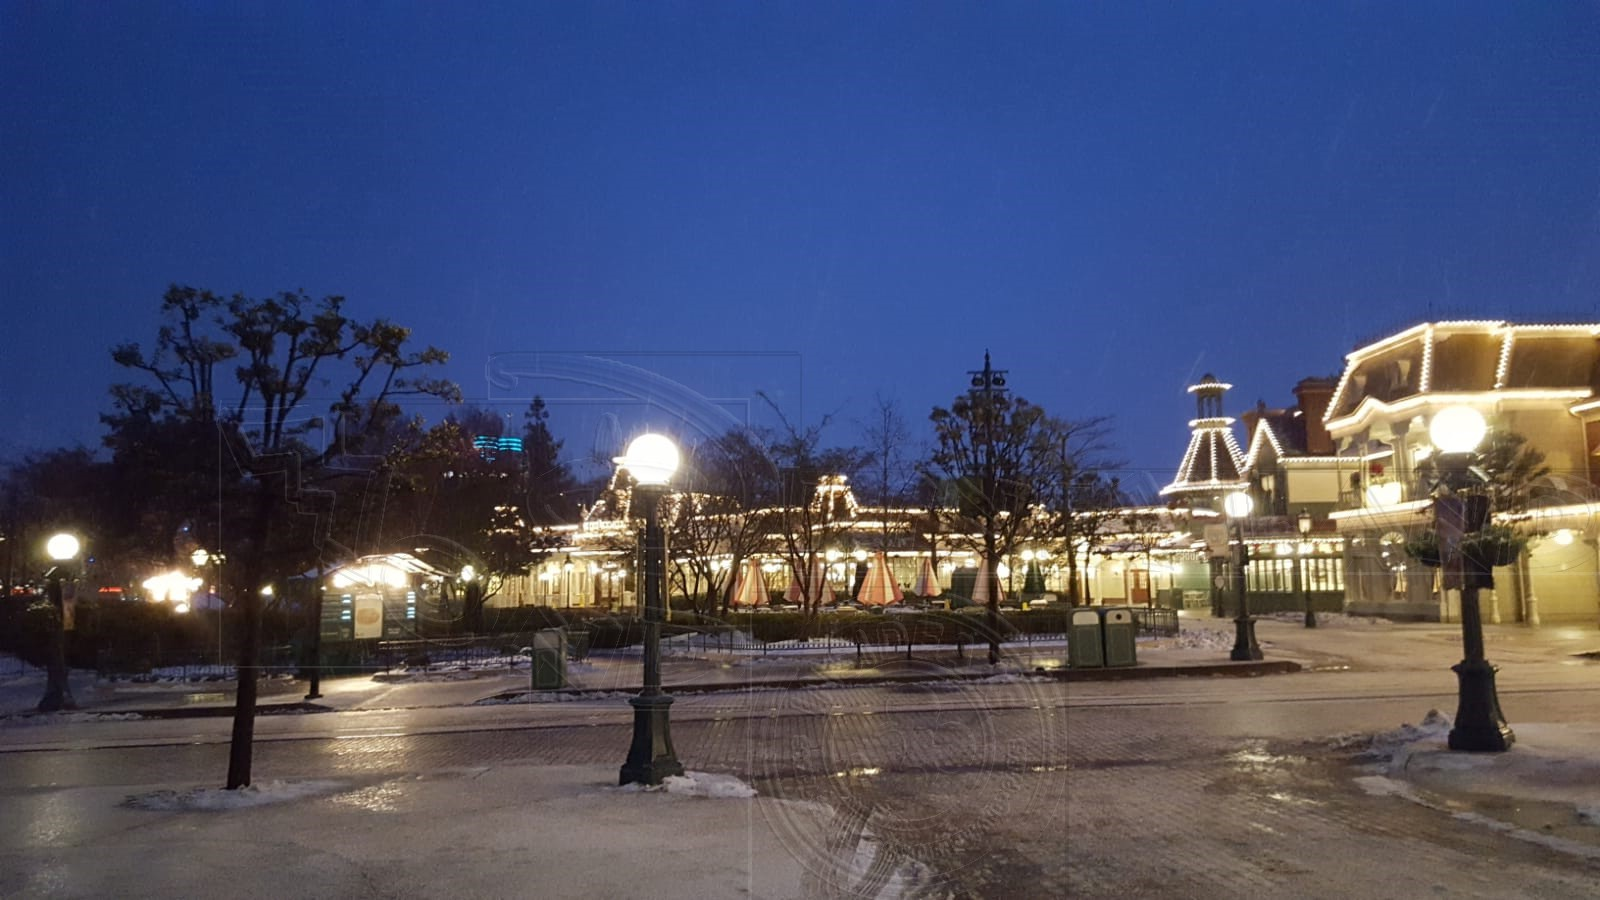 2018 - Disneyland Paris sotto la neve - Pagina 4 01neve20